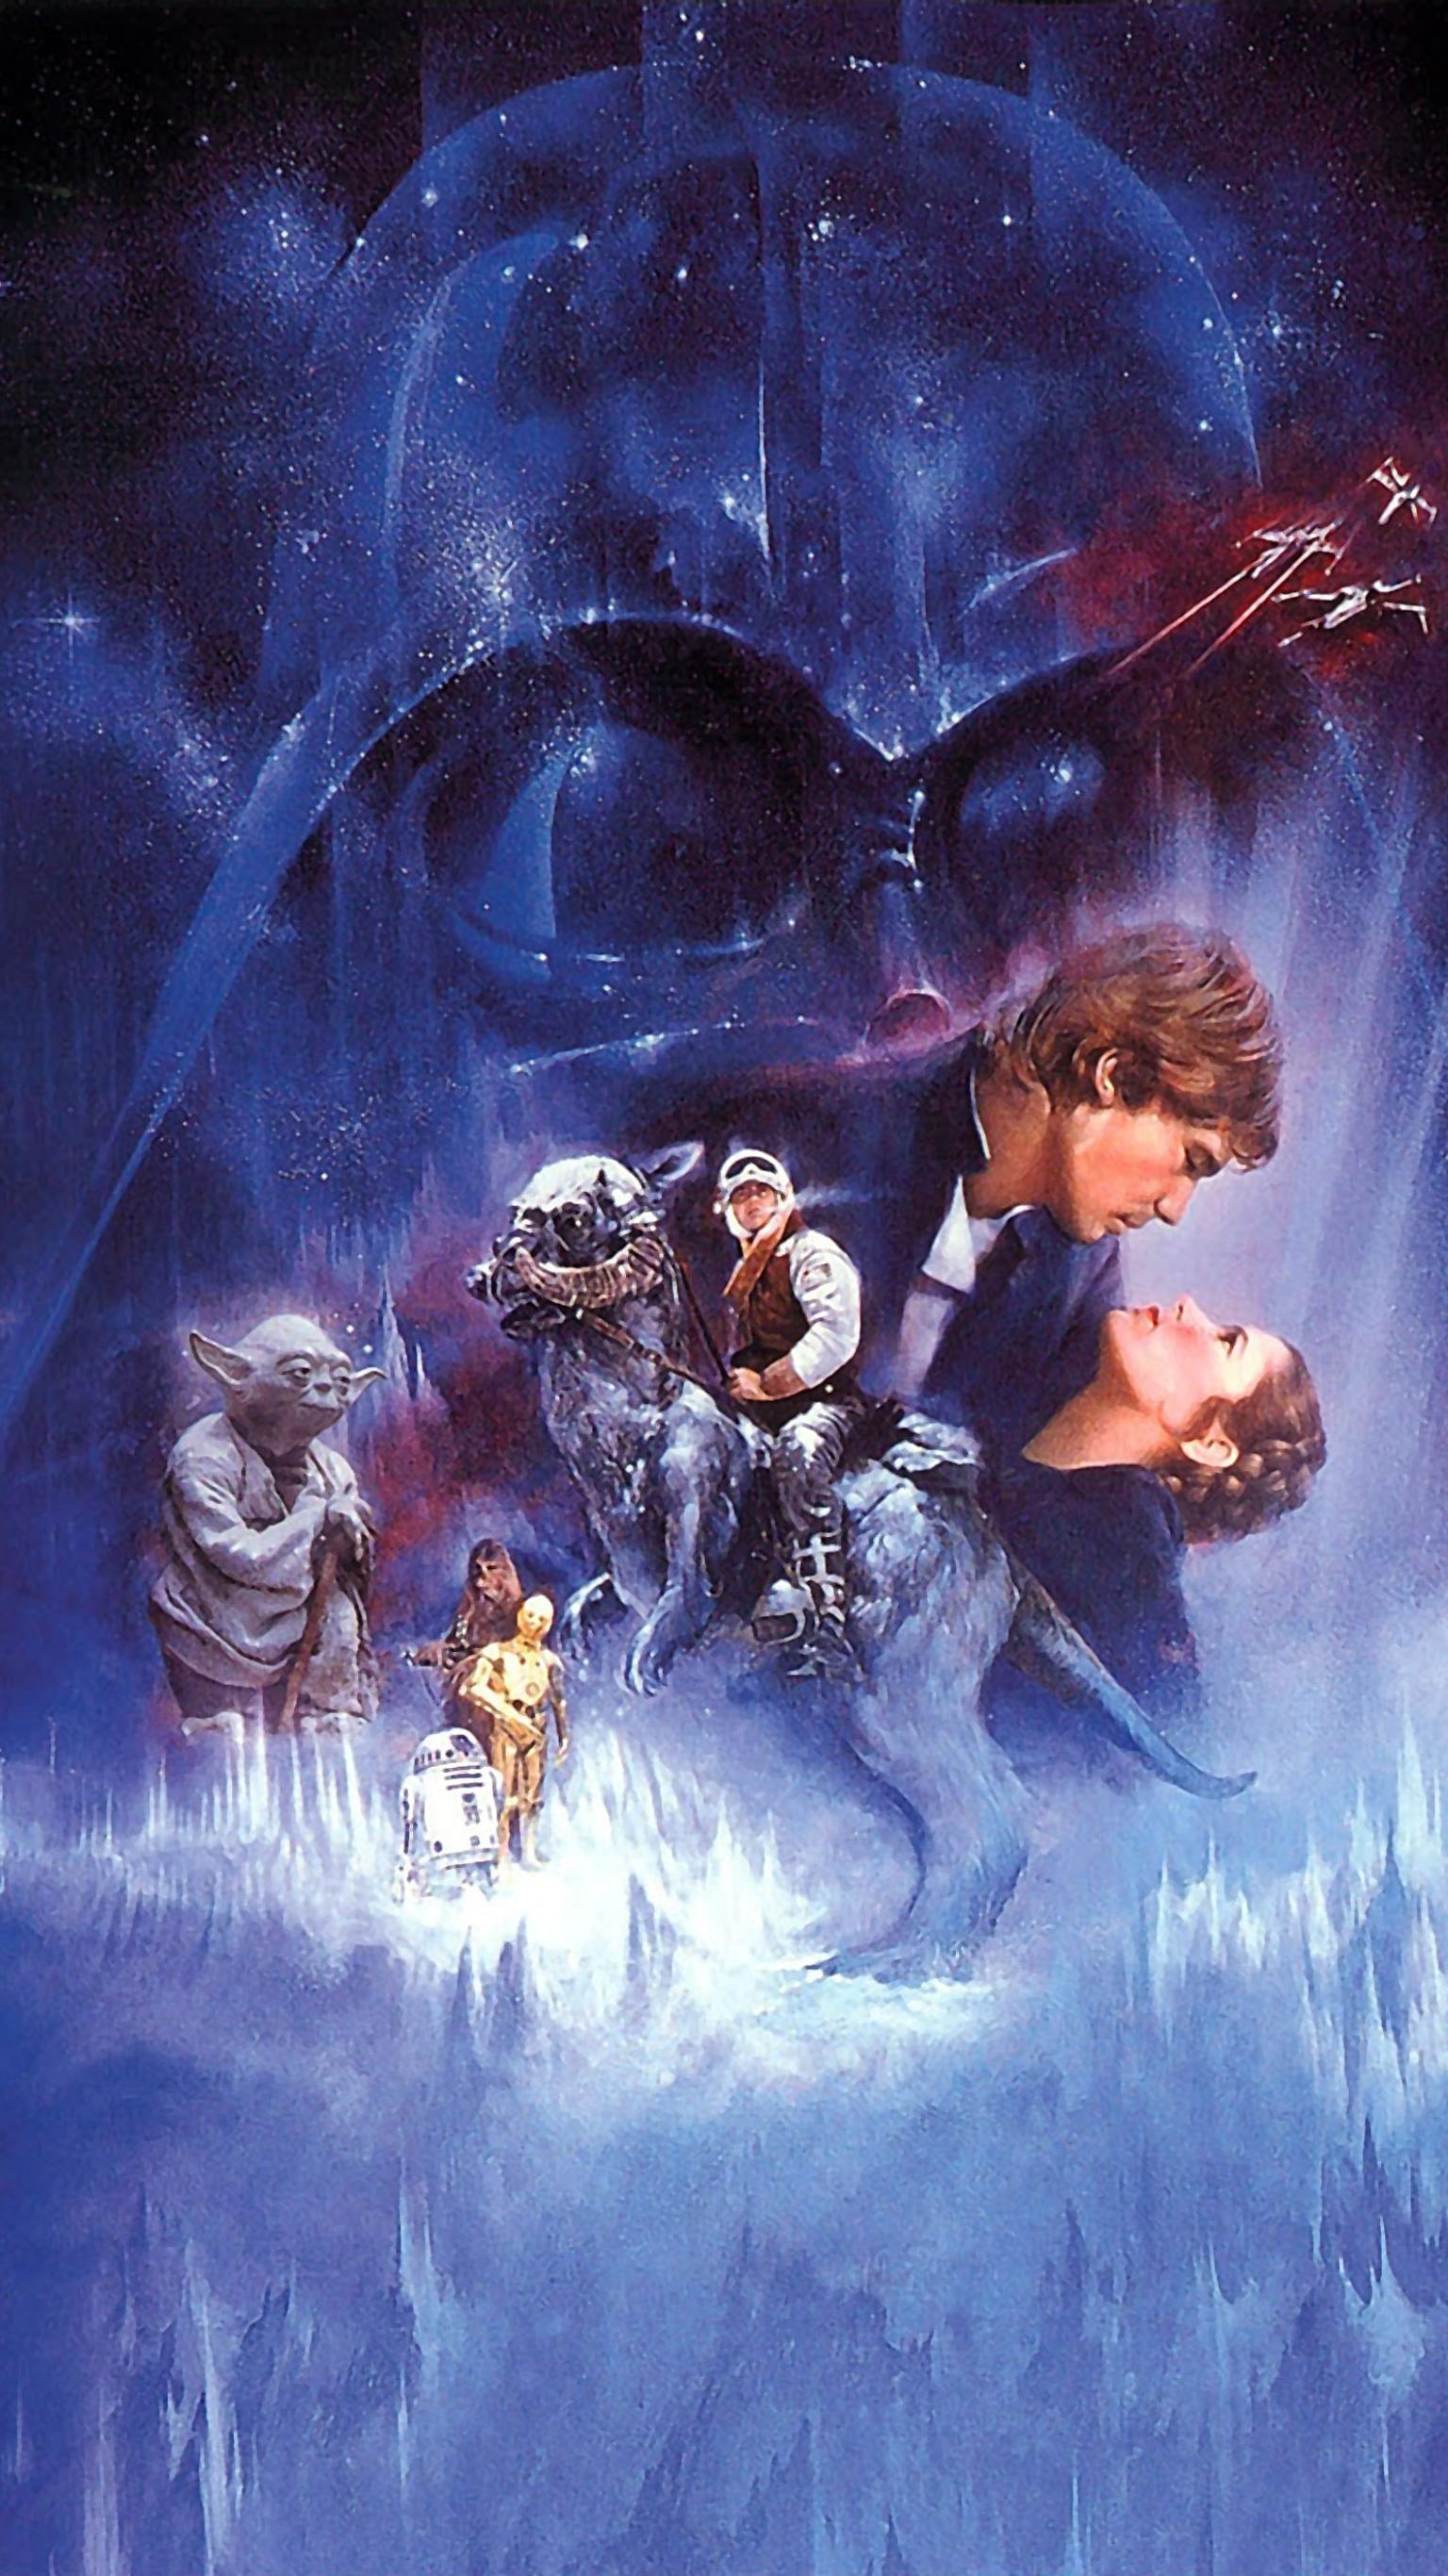 The Empire Strikes Back 1980 Phone Wallpaper Moviemania In 2020 Star Wars Poster Star Wars Art Star Wars Poster Art